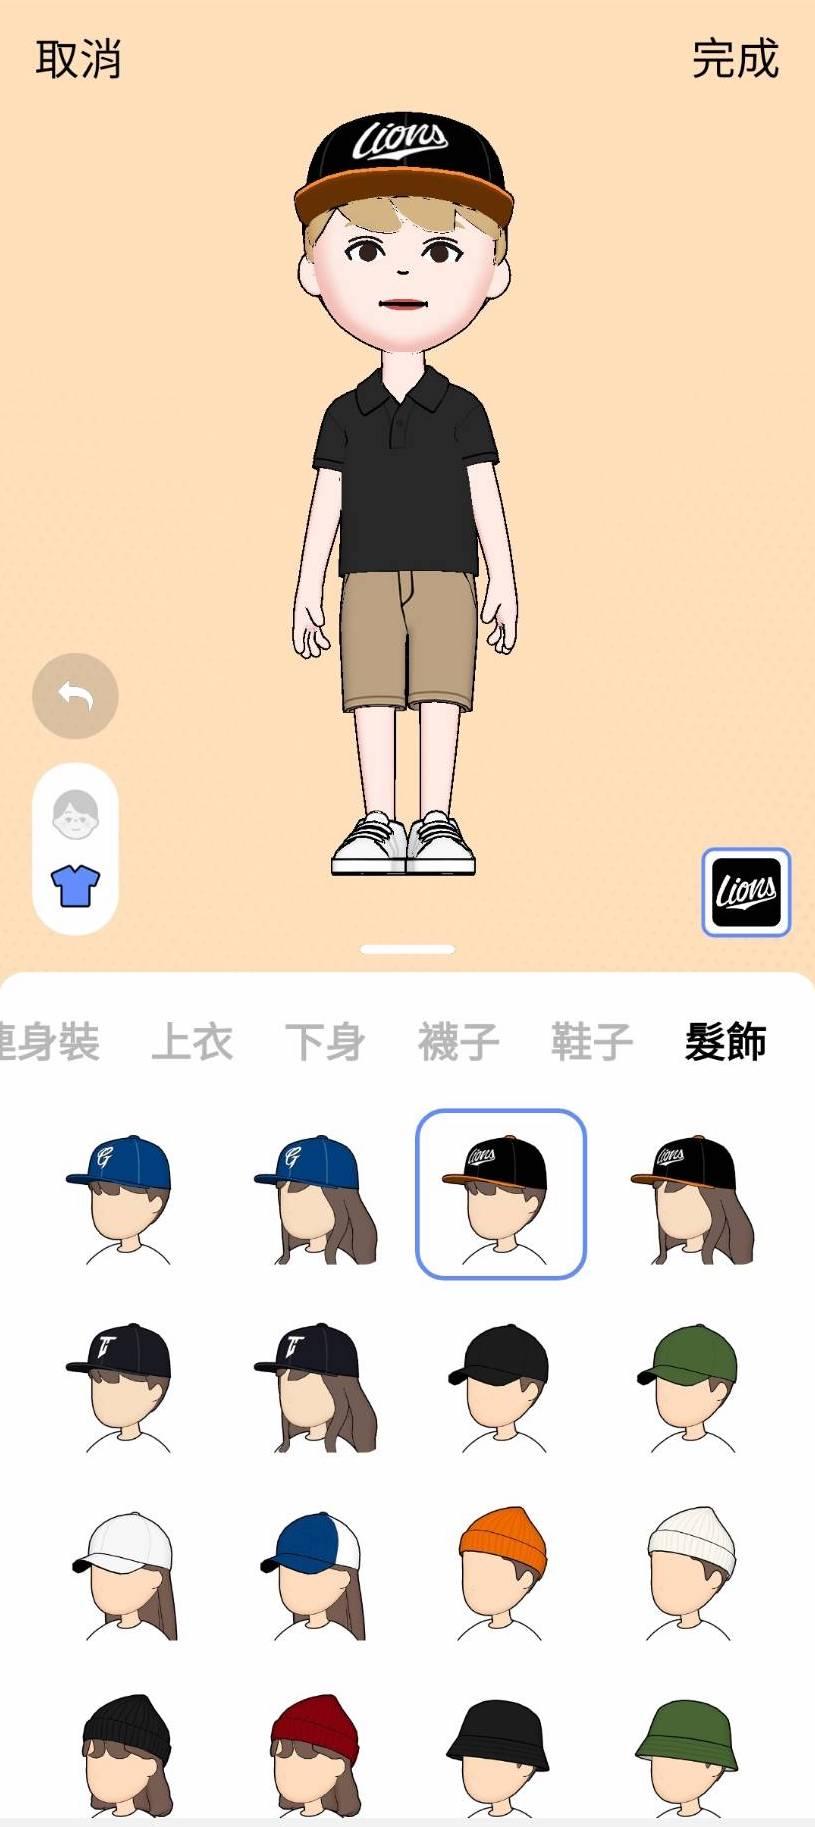 Line 自訂虛擬人像